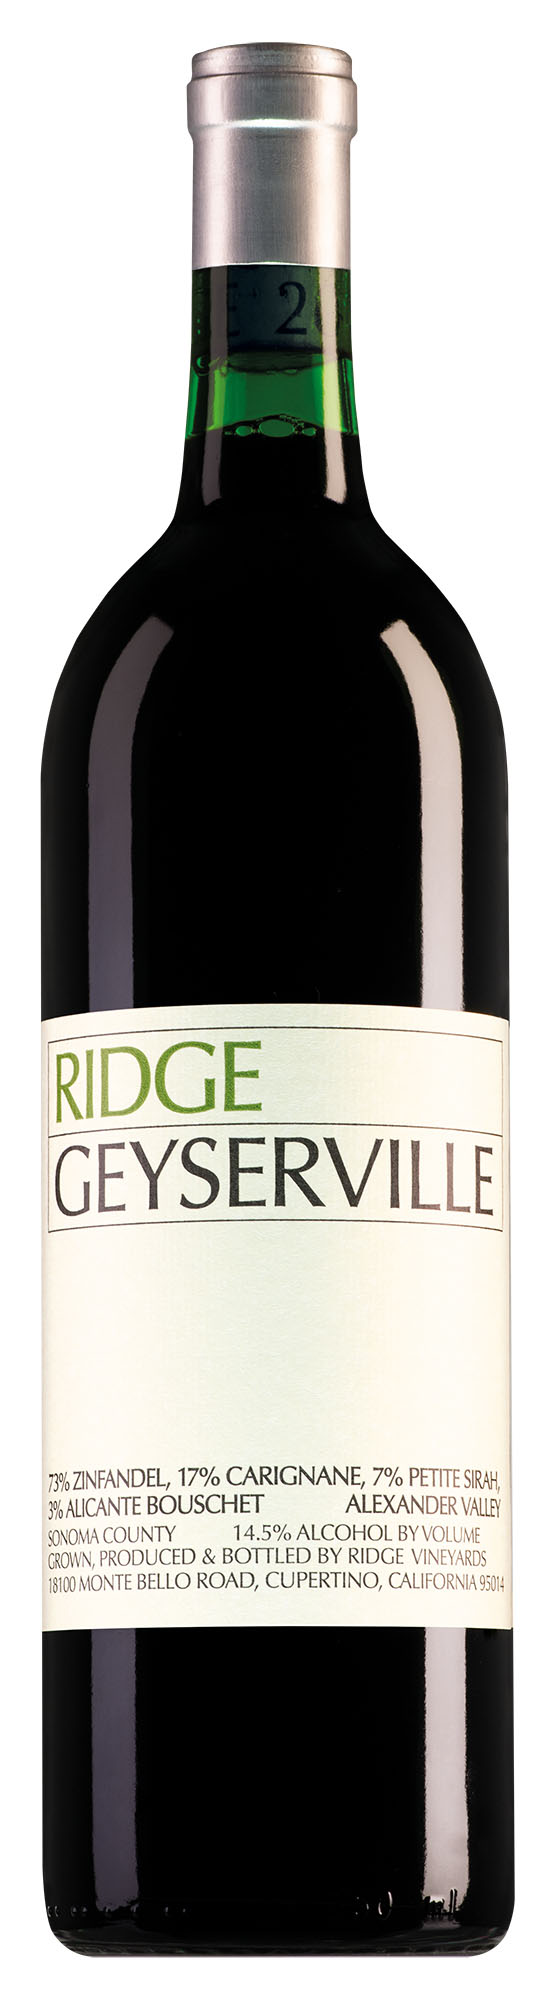 Ridge Alexander Valley Geyserville Zinfandel